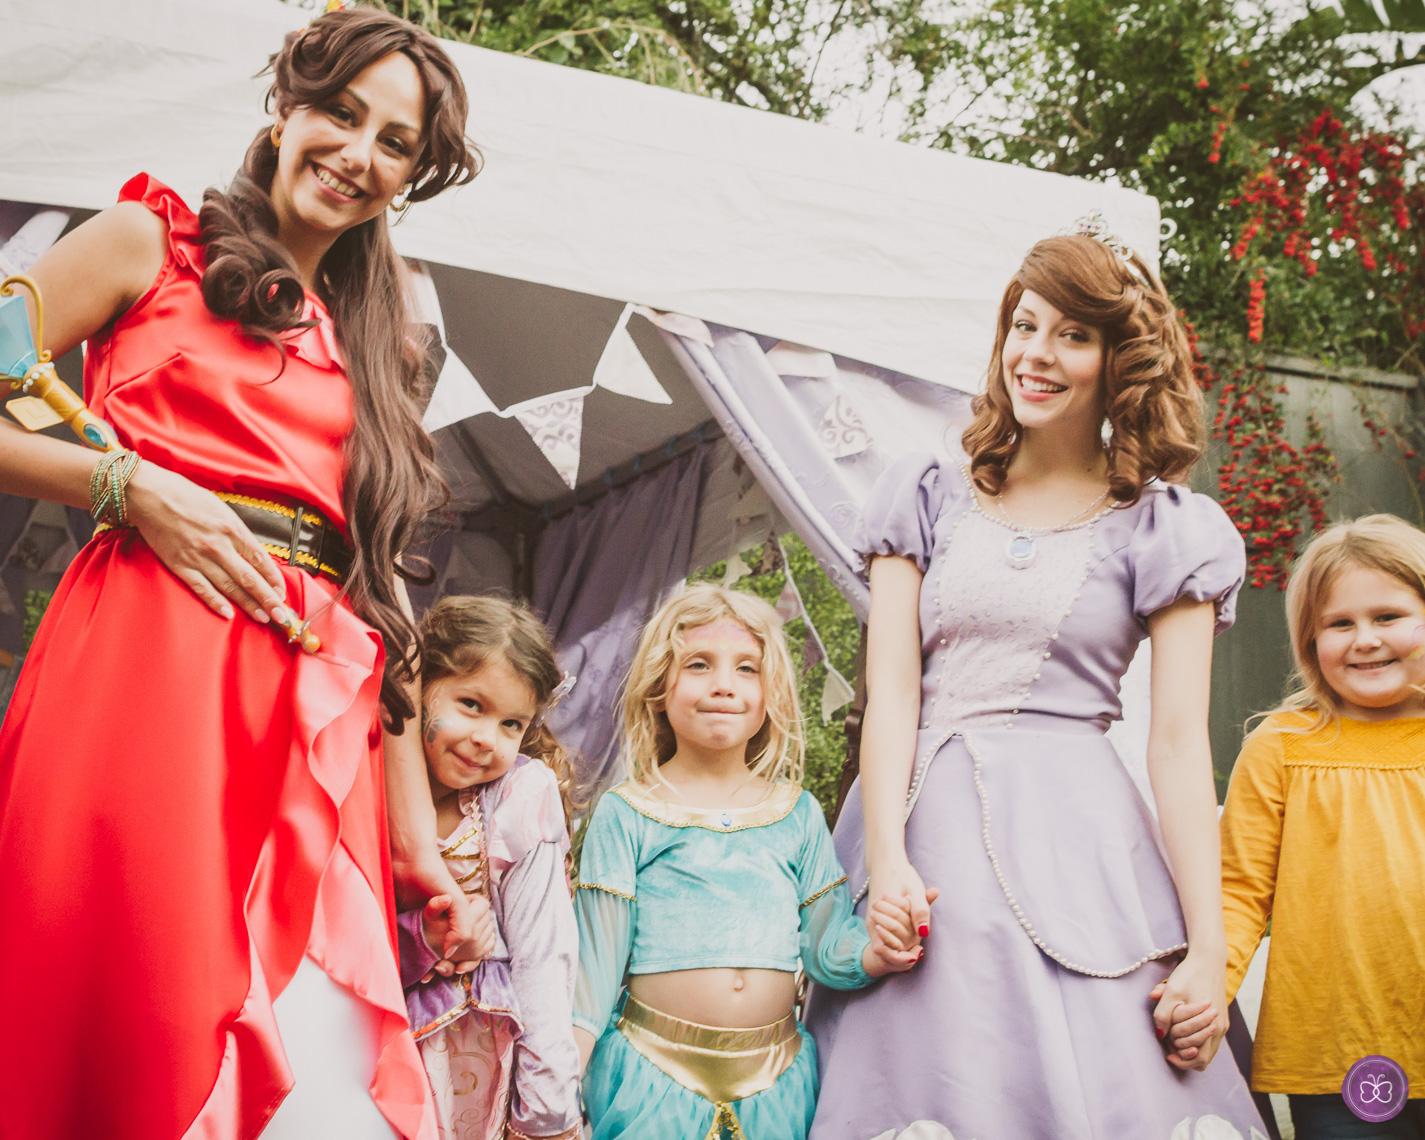 rosalind sofia elena princess party santa monica (9 of 15).jpg